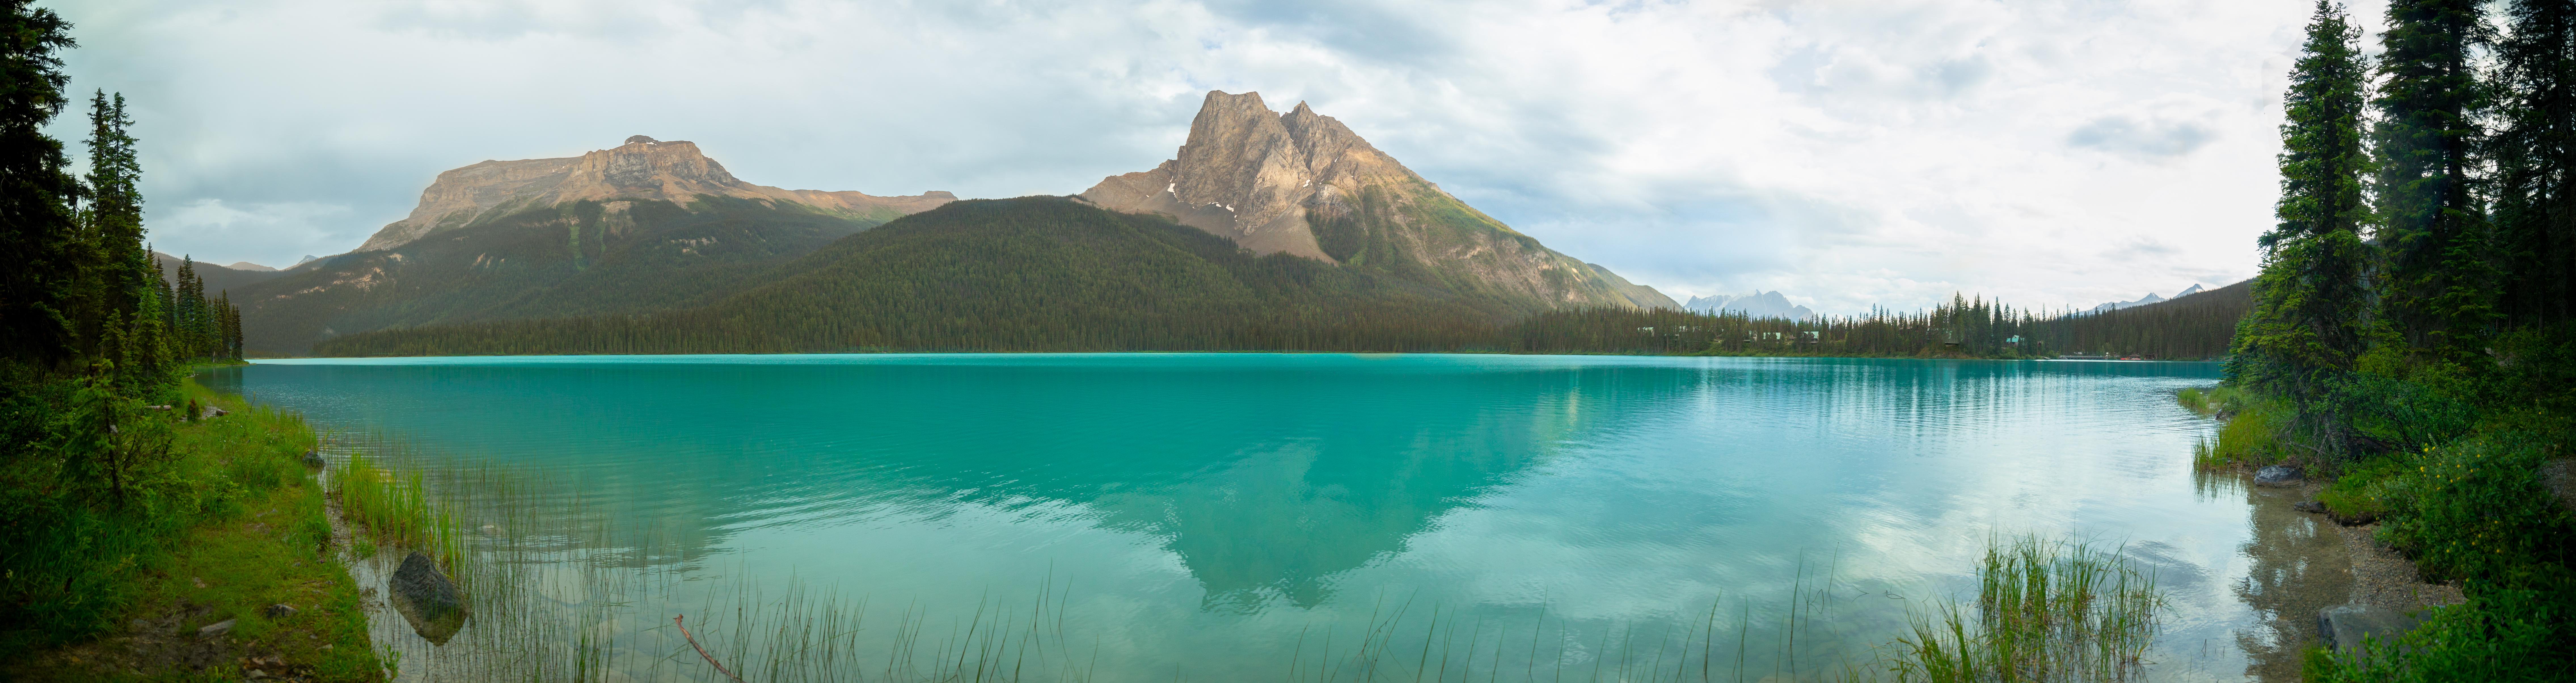 Emerald Lake Panorama-1